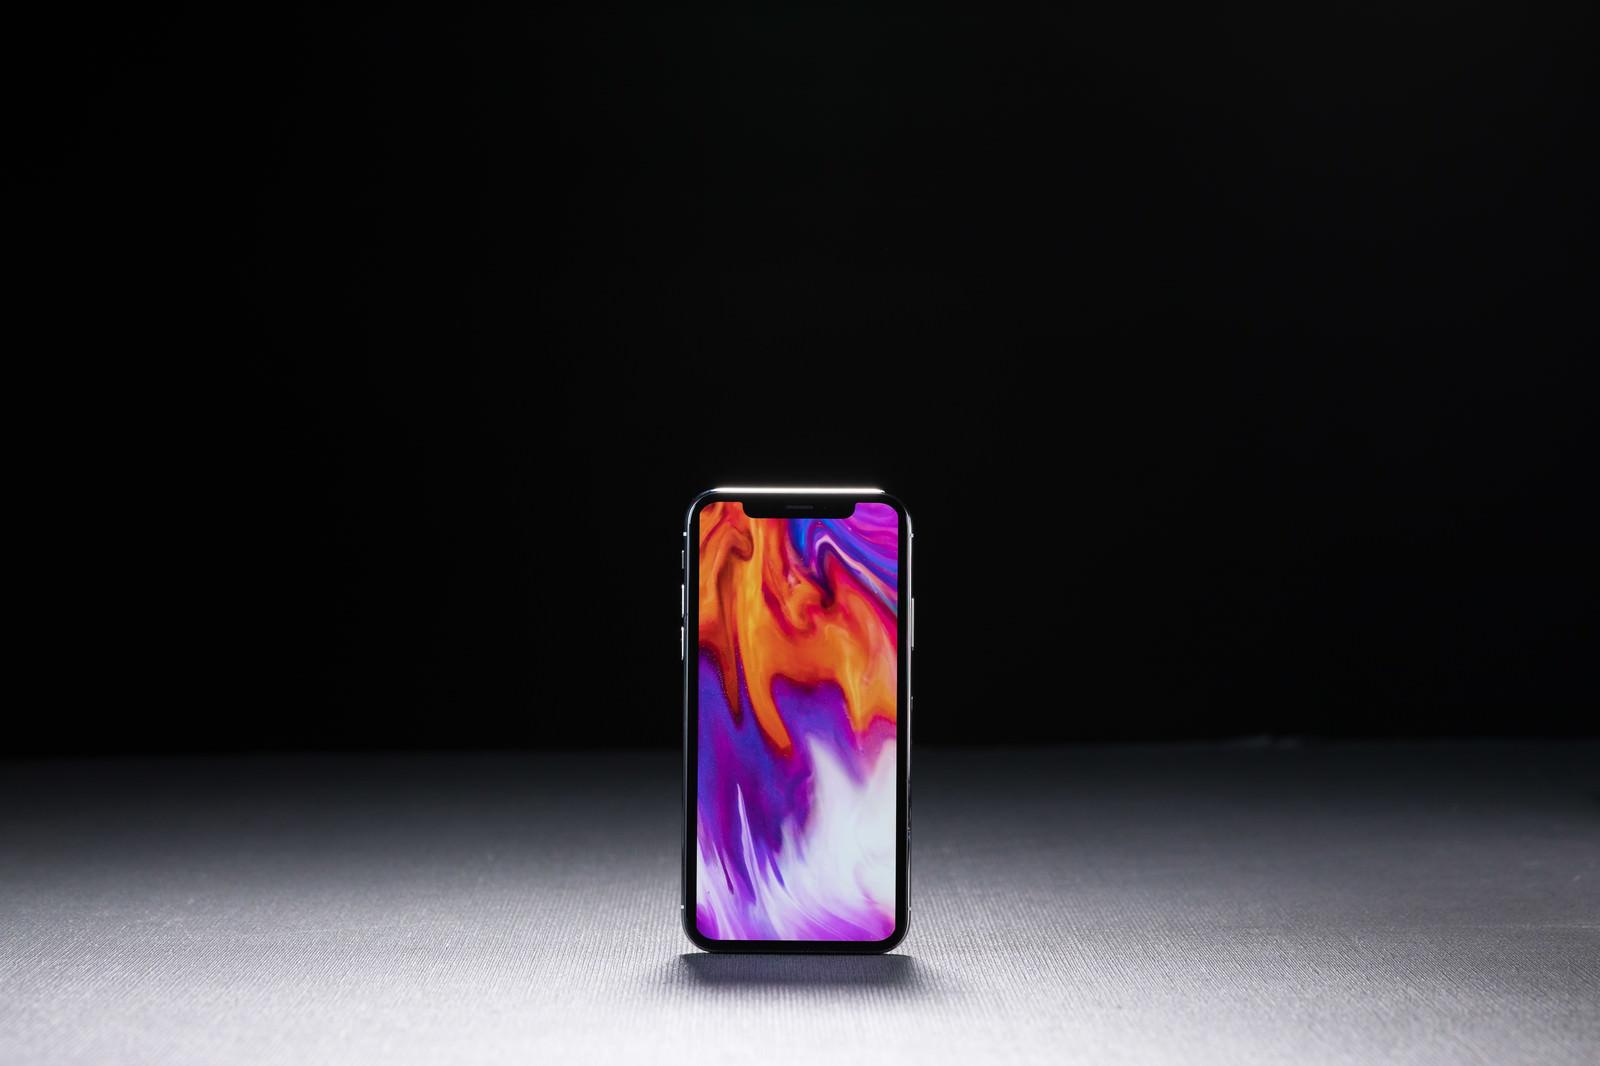 「iPhone X の画面表示領域」の写真